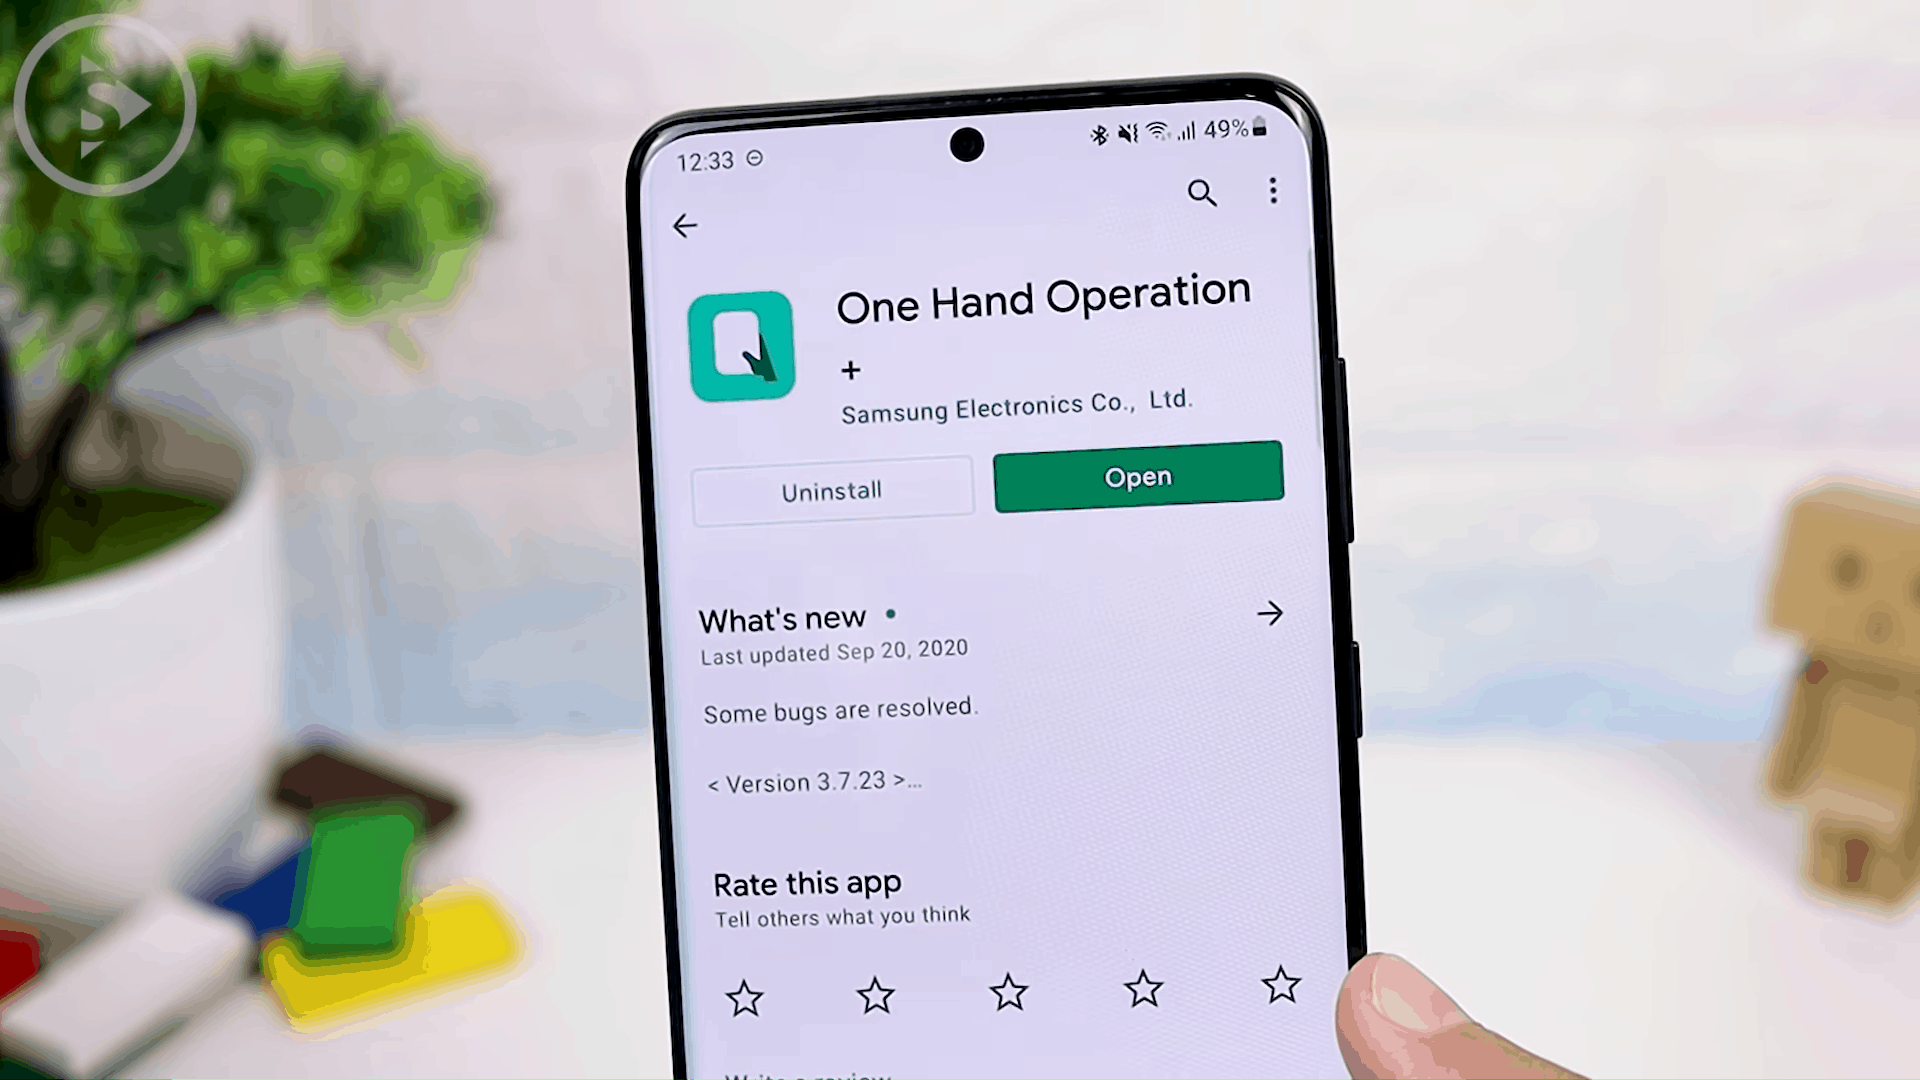 One Hand Operation+ (Long Swipe)